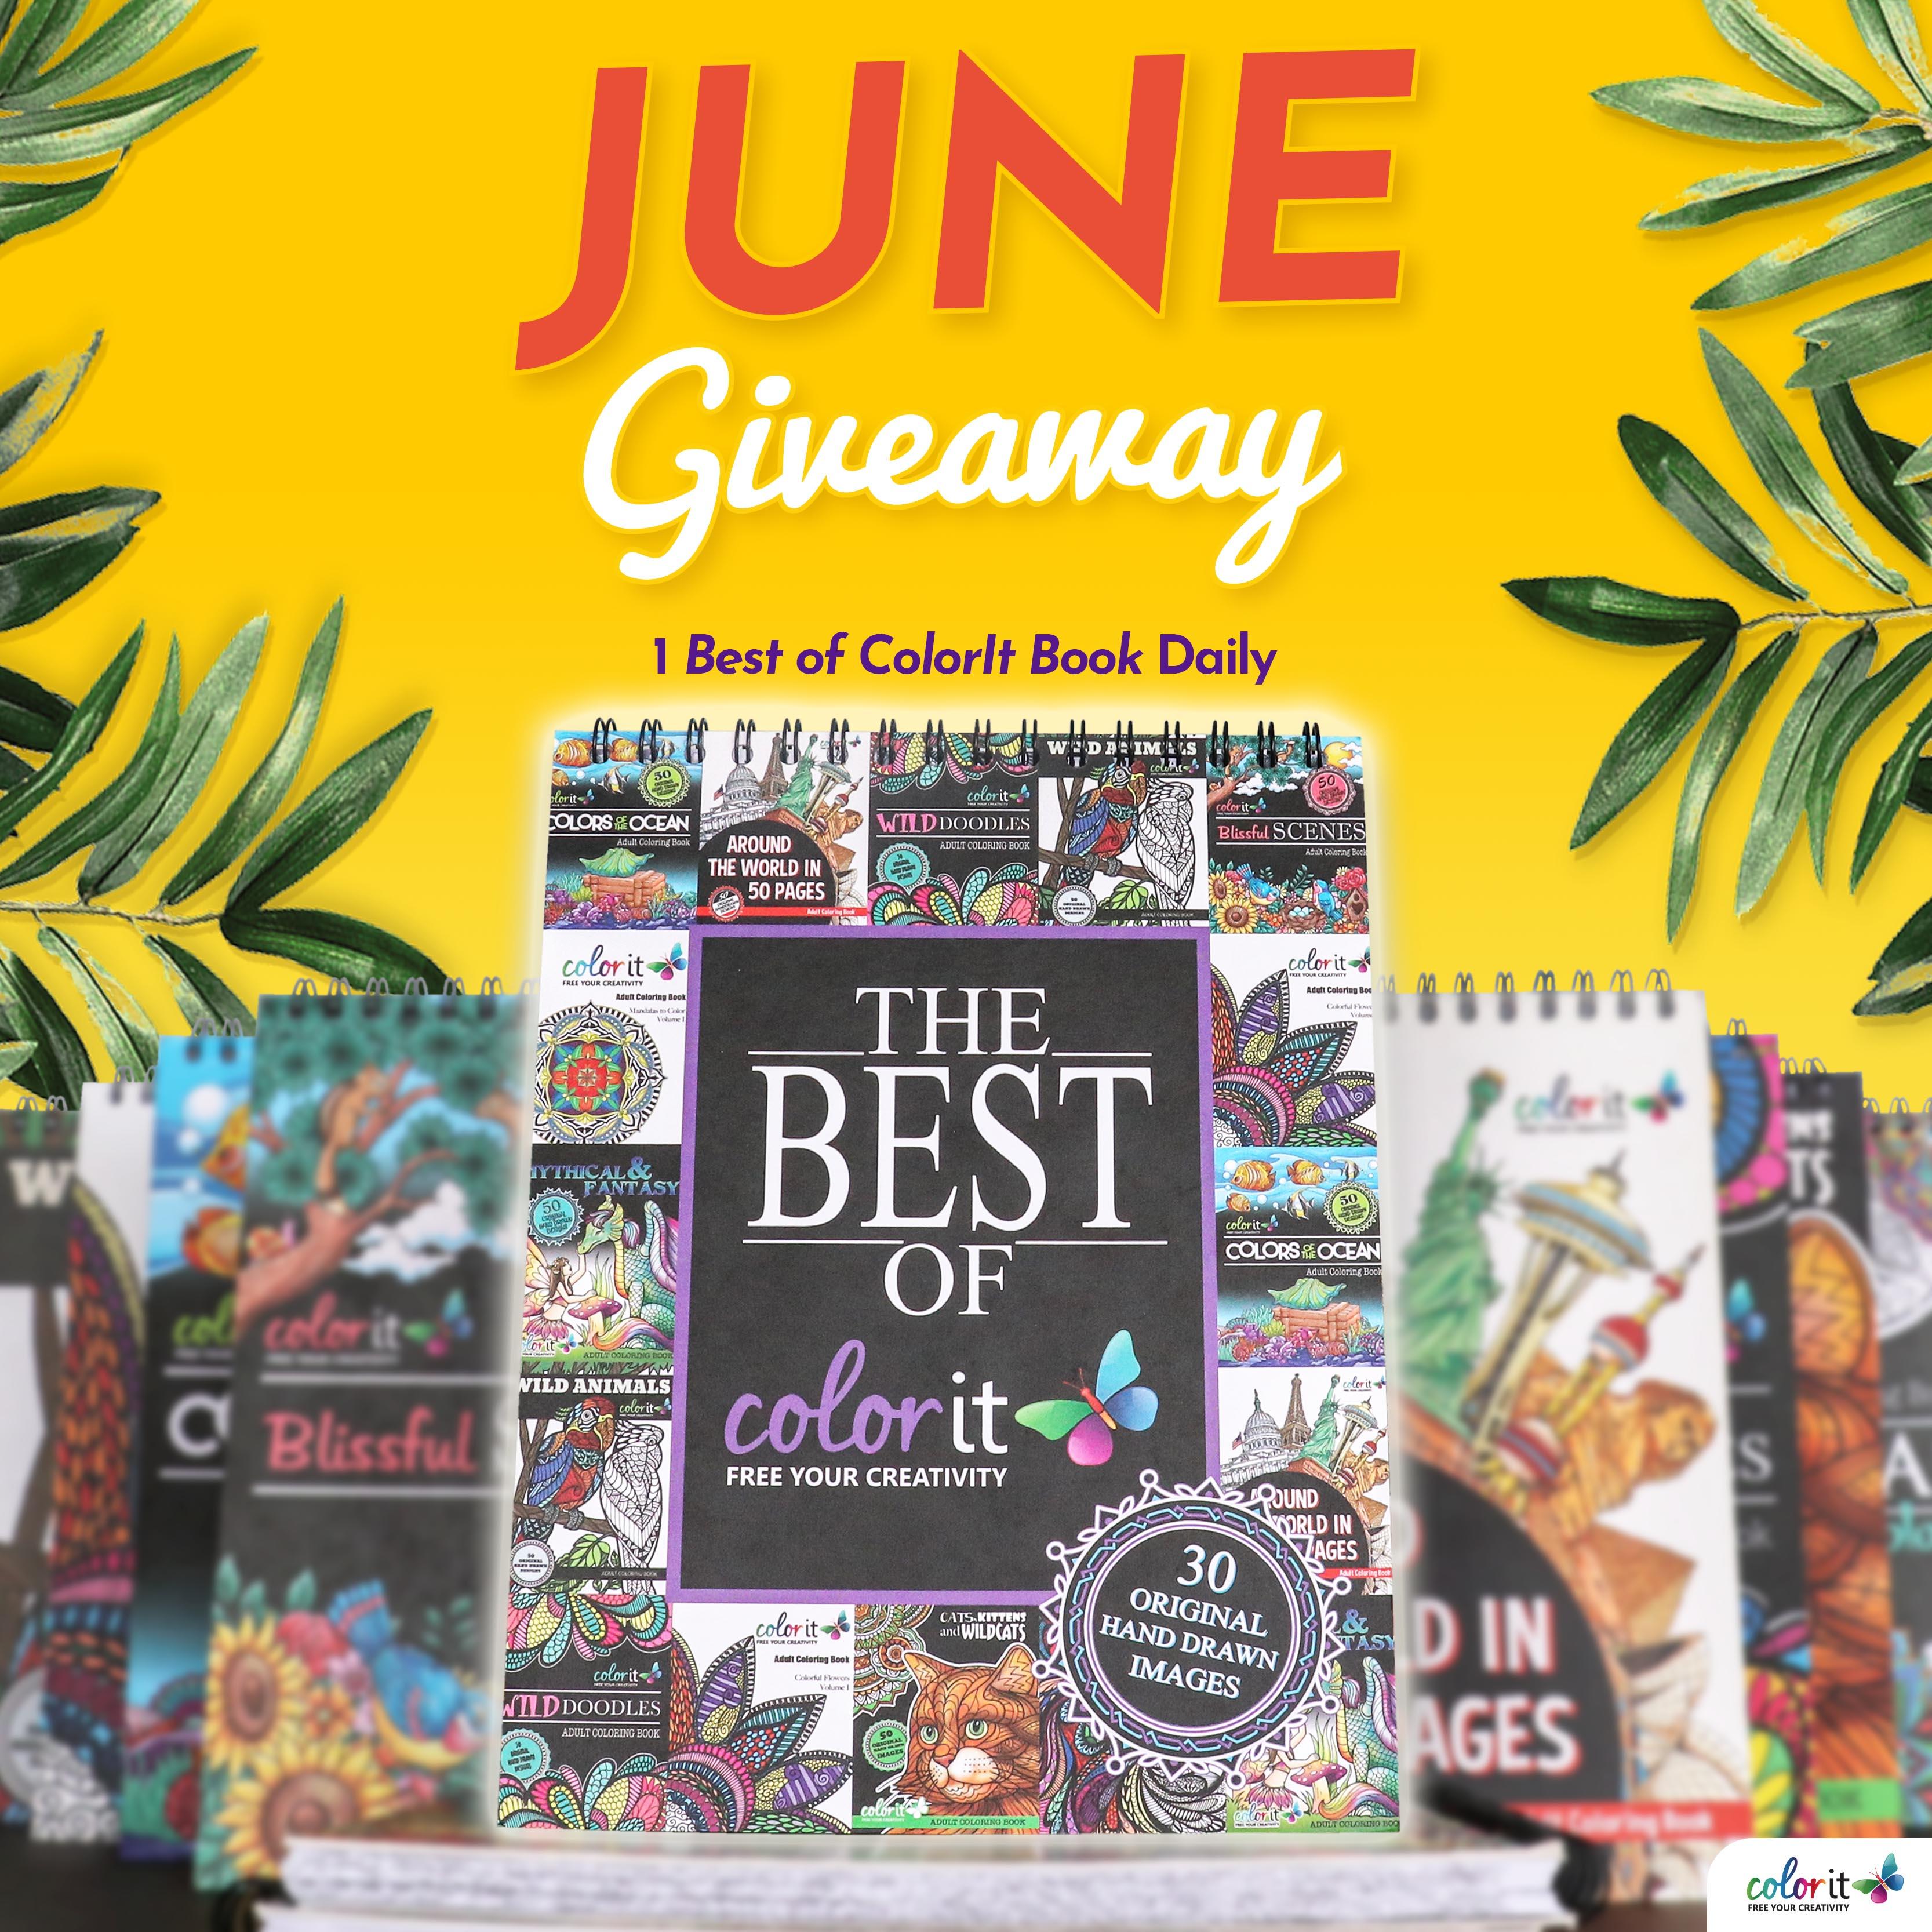 June 2019 Best of ColorIt Coloring Book